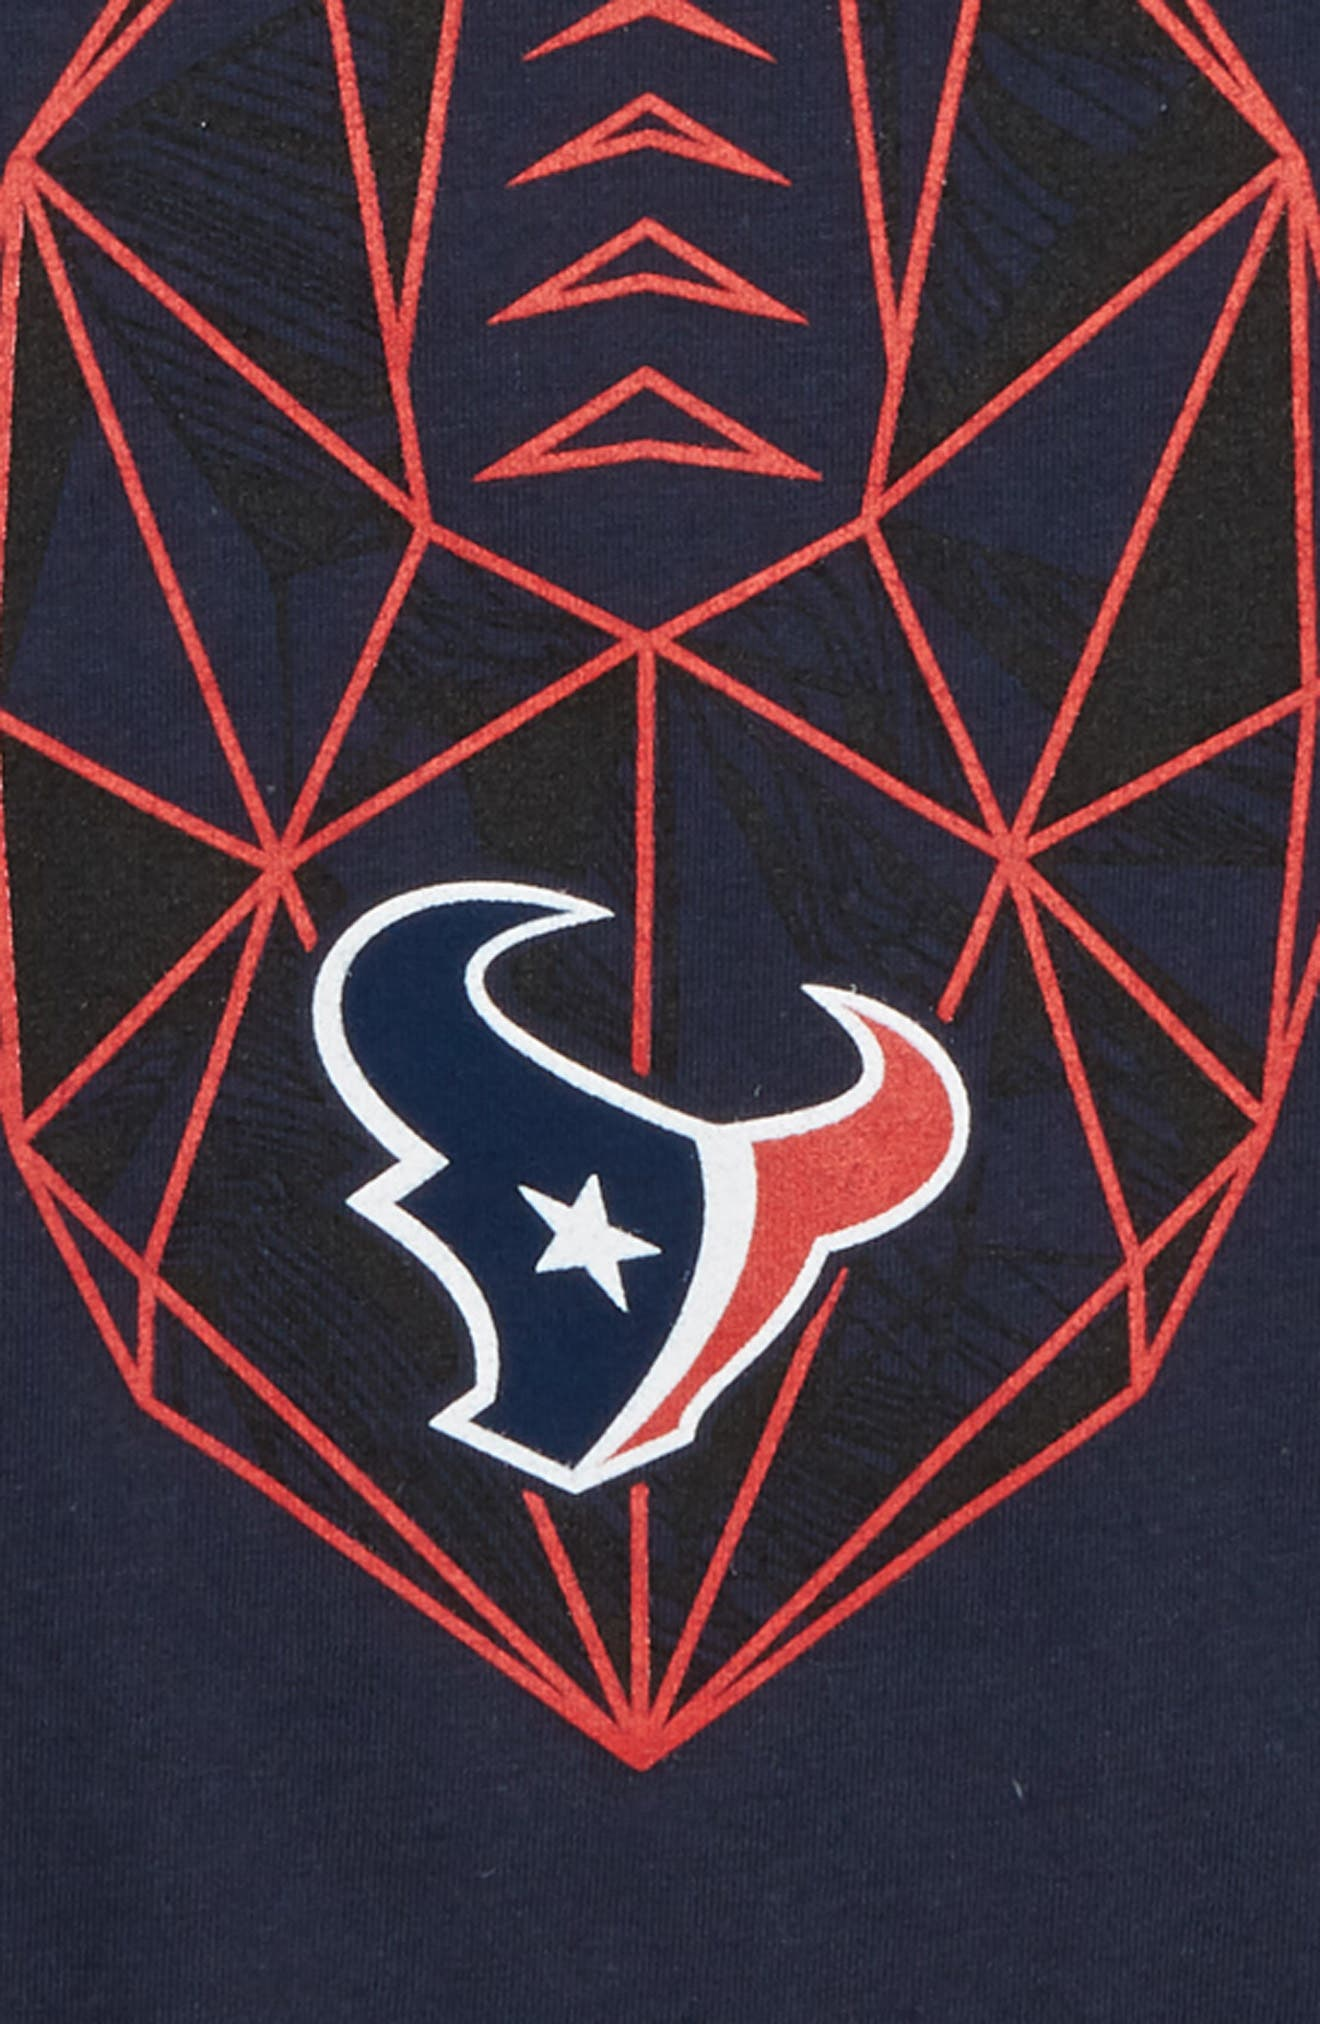 NFL Houston Texans Legend T-Shirt,                             Alternate thumbnail 2, color,                             NAVY